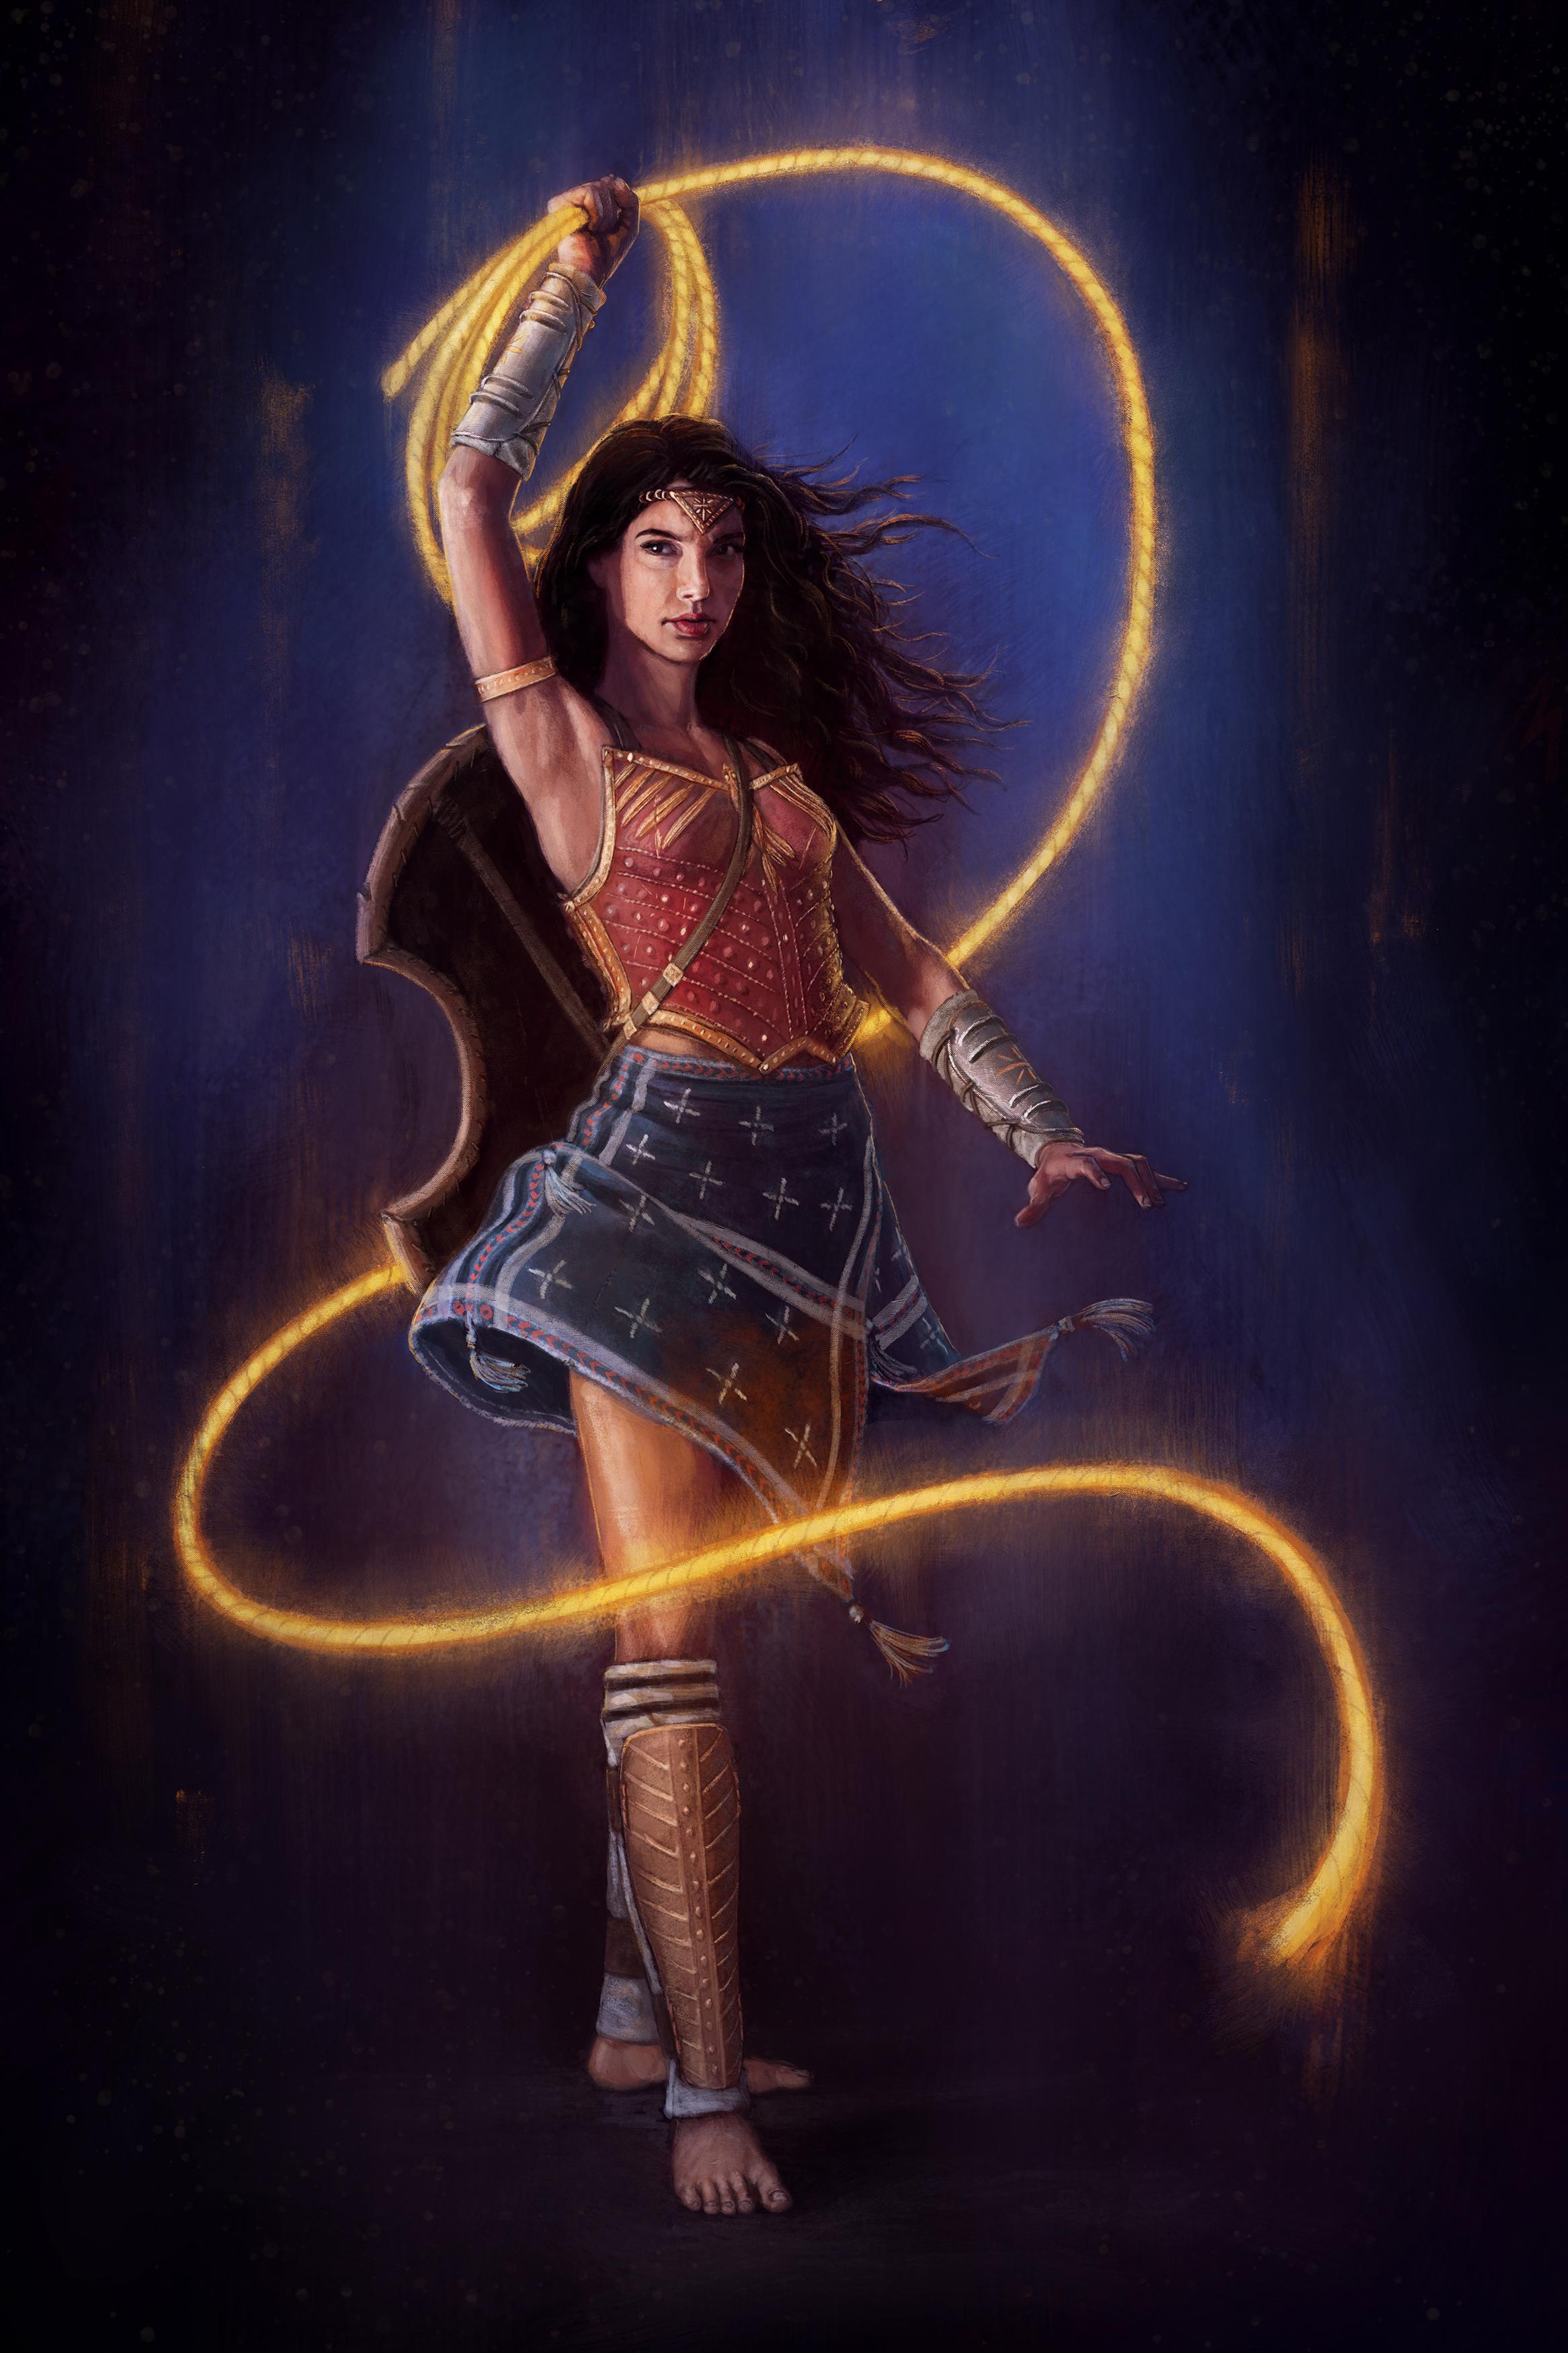 Diana of Themyscira - Wonder Woman - Full sm